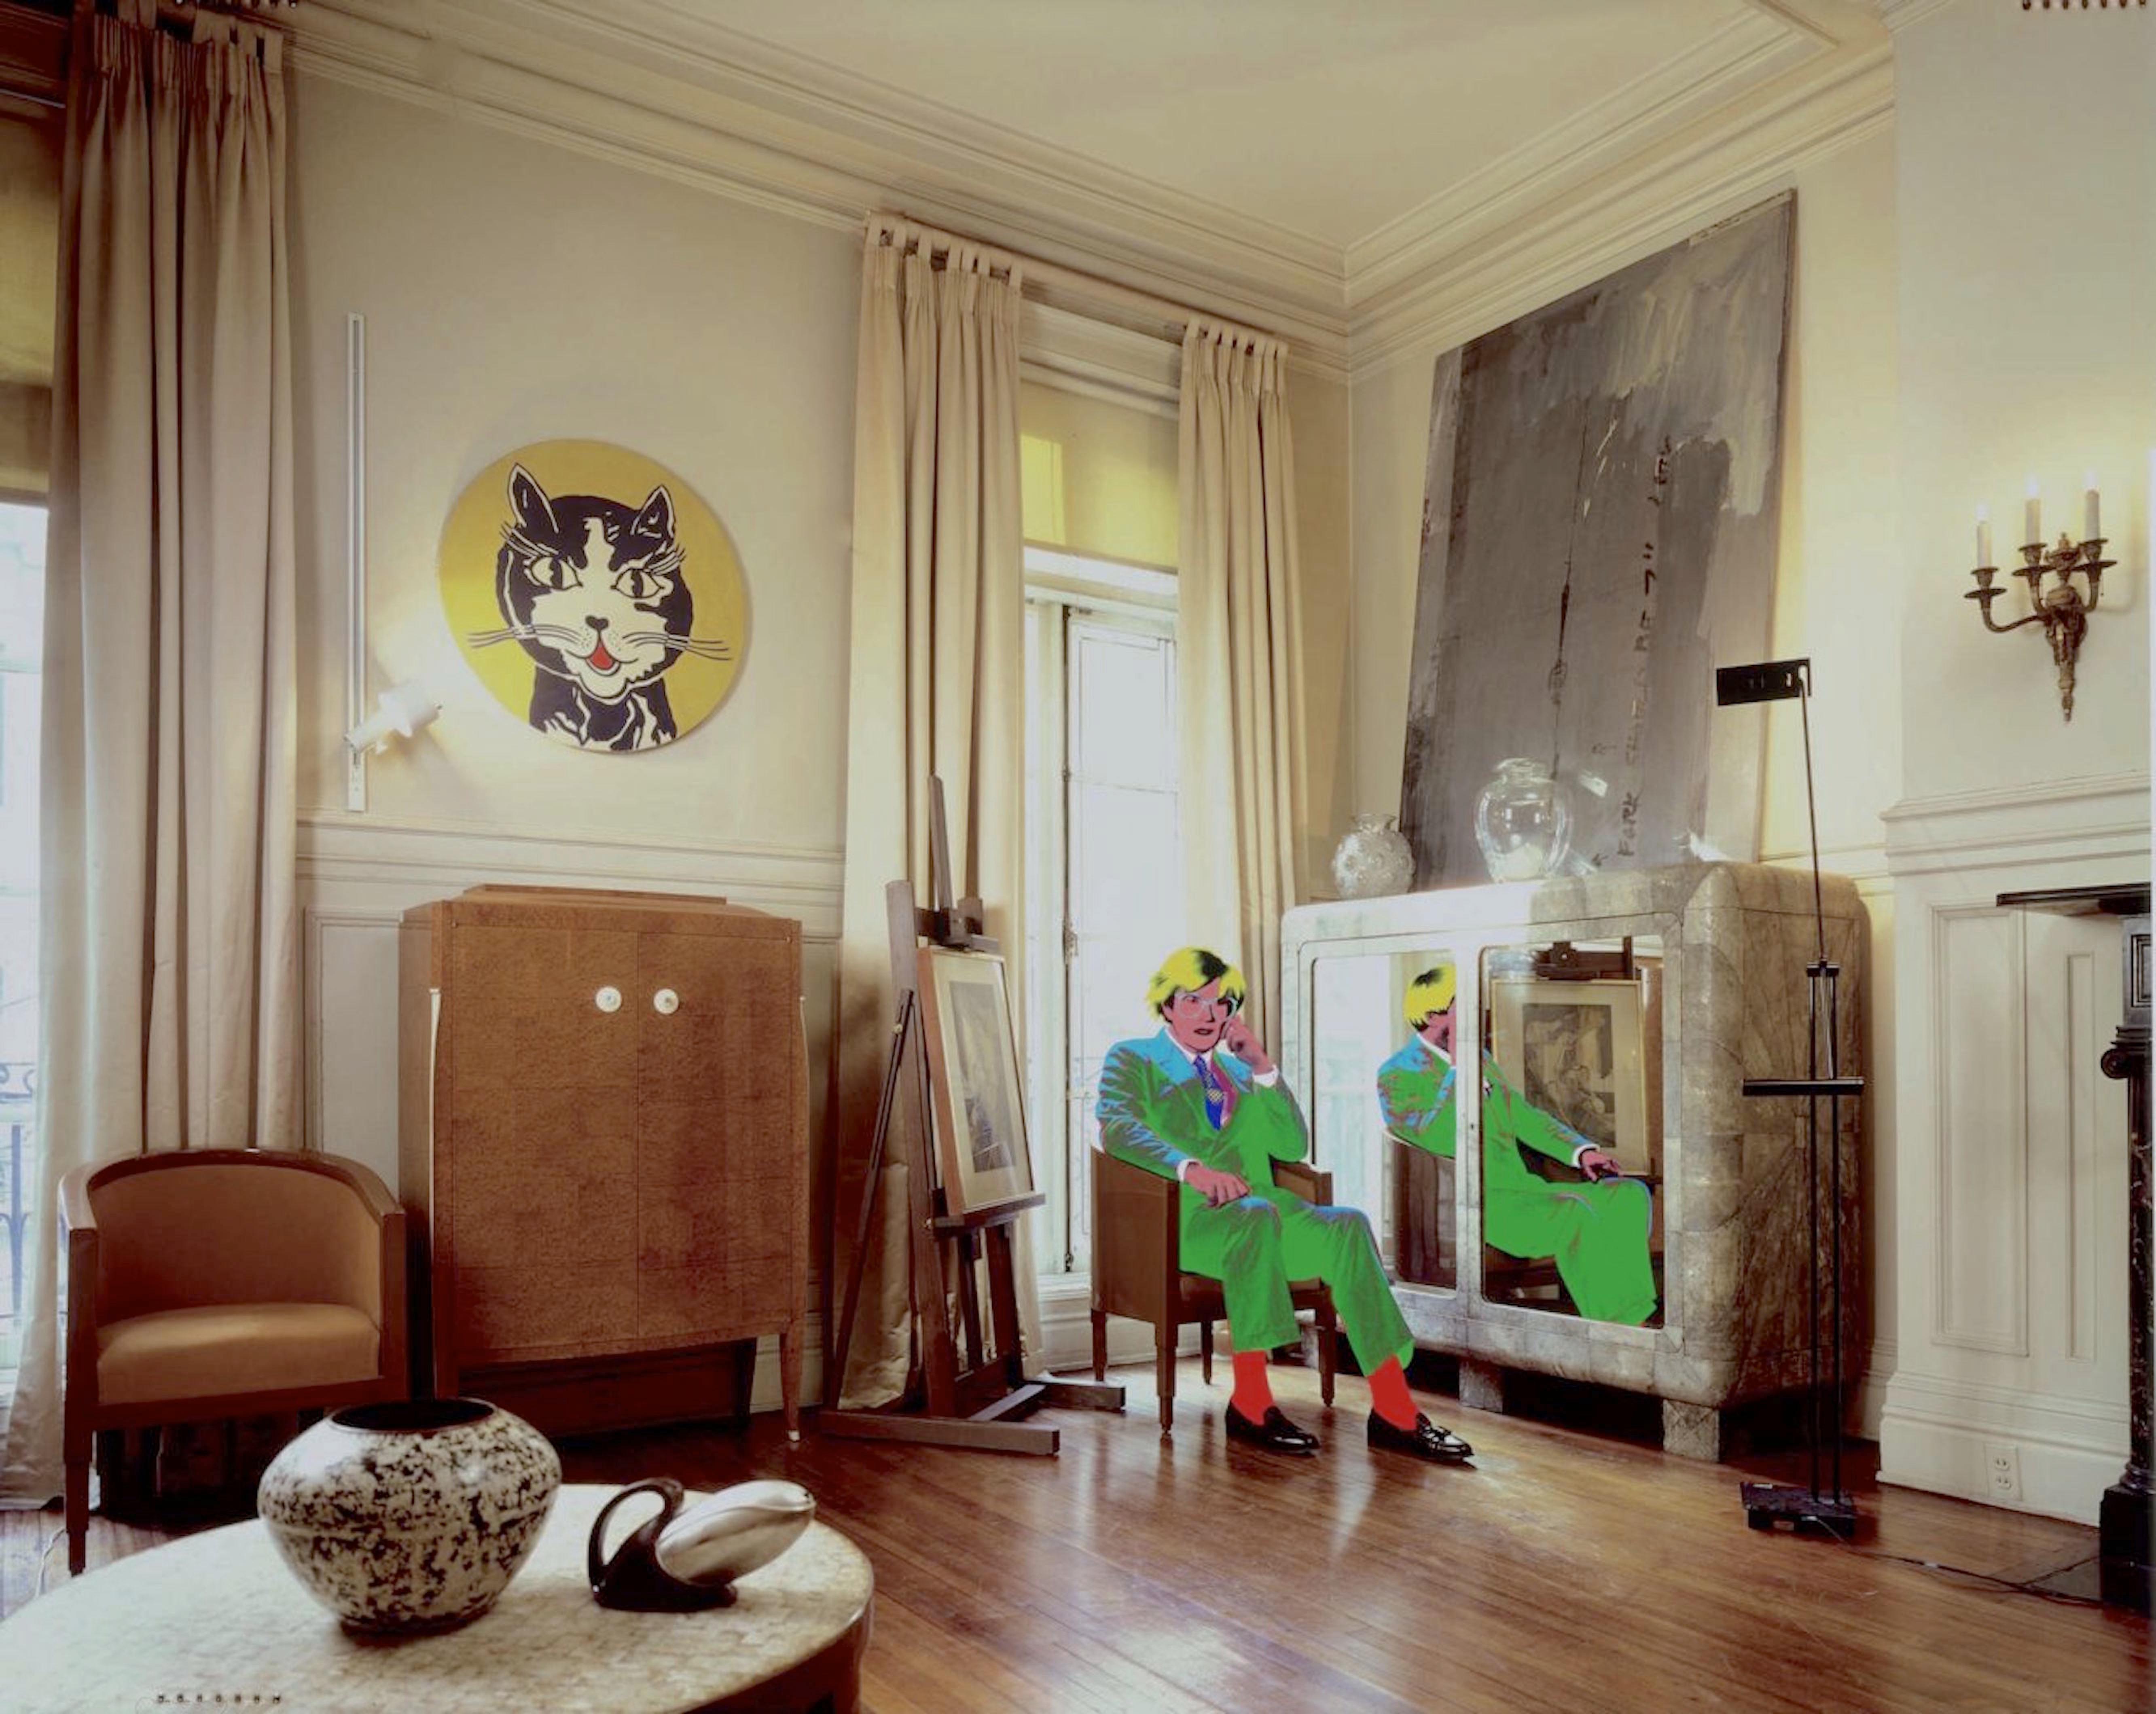 Andy Warhol's Living Room, NYC